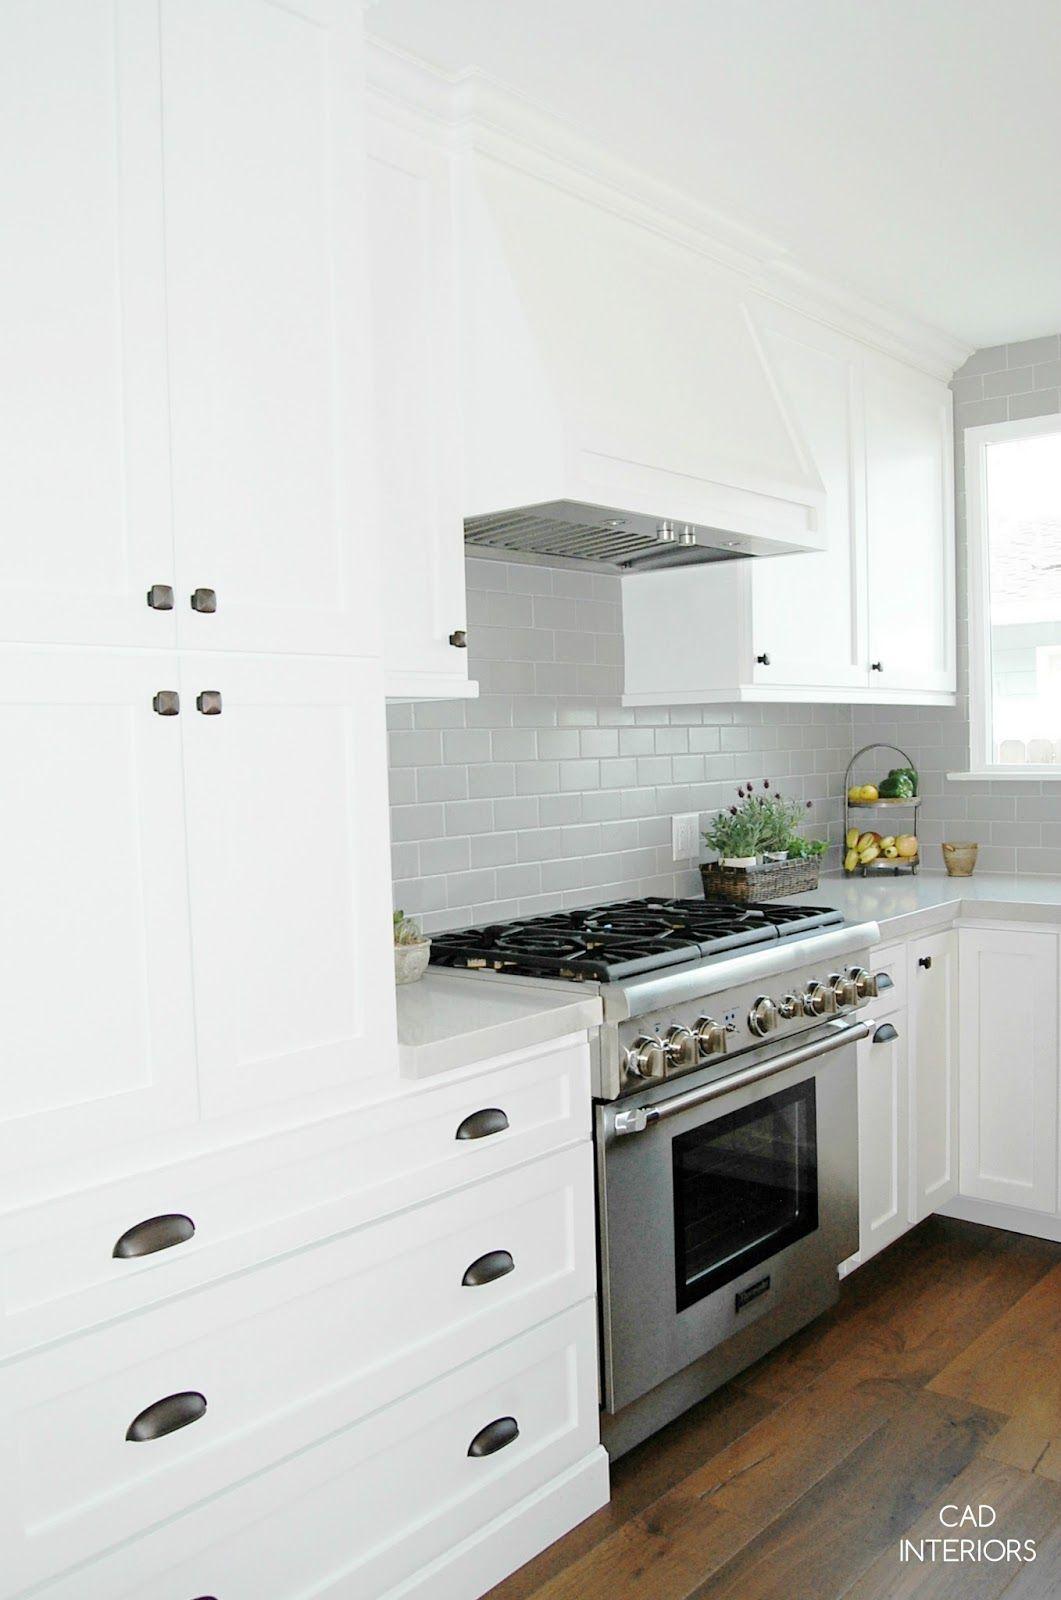 CAD INTERIORS_white shaker profile cabinets_appliance ...